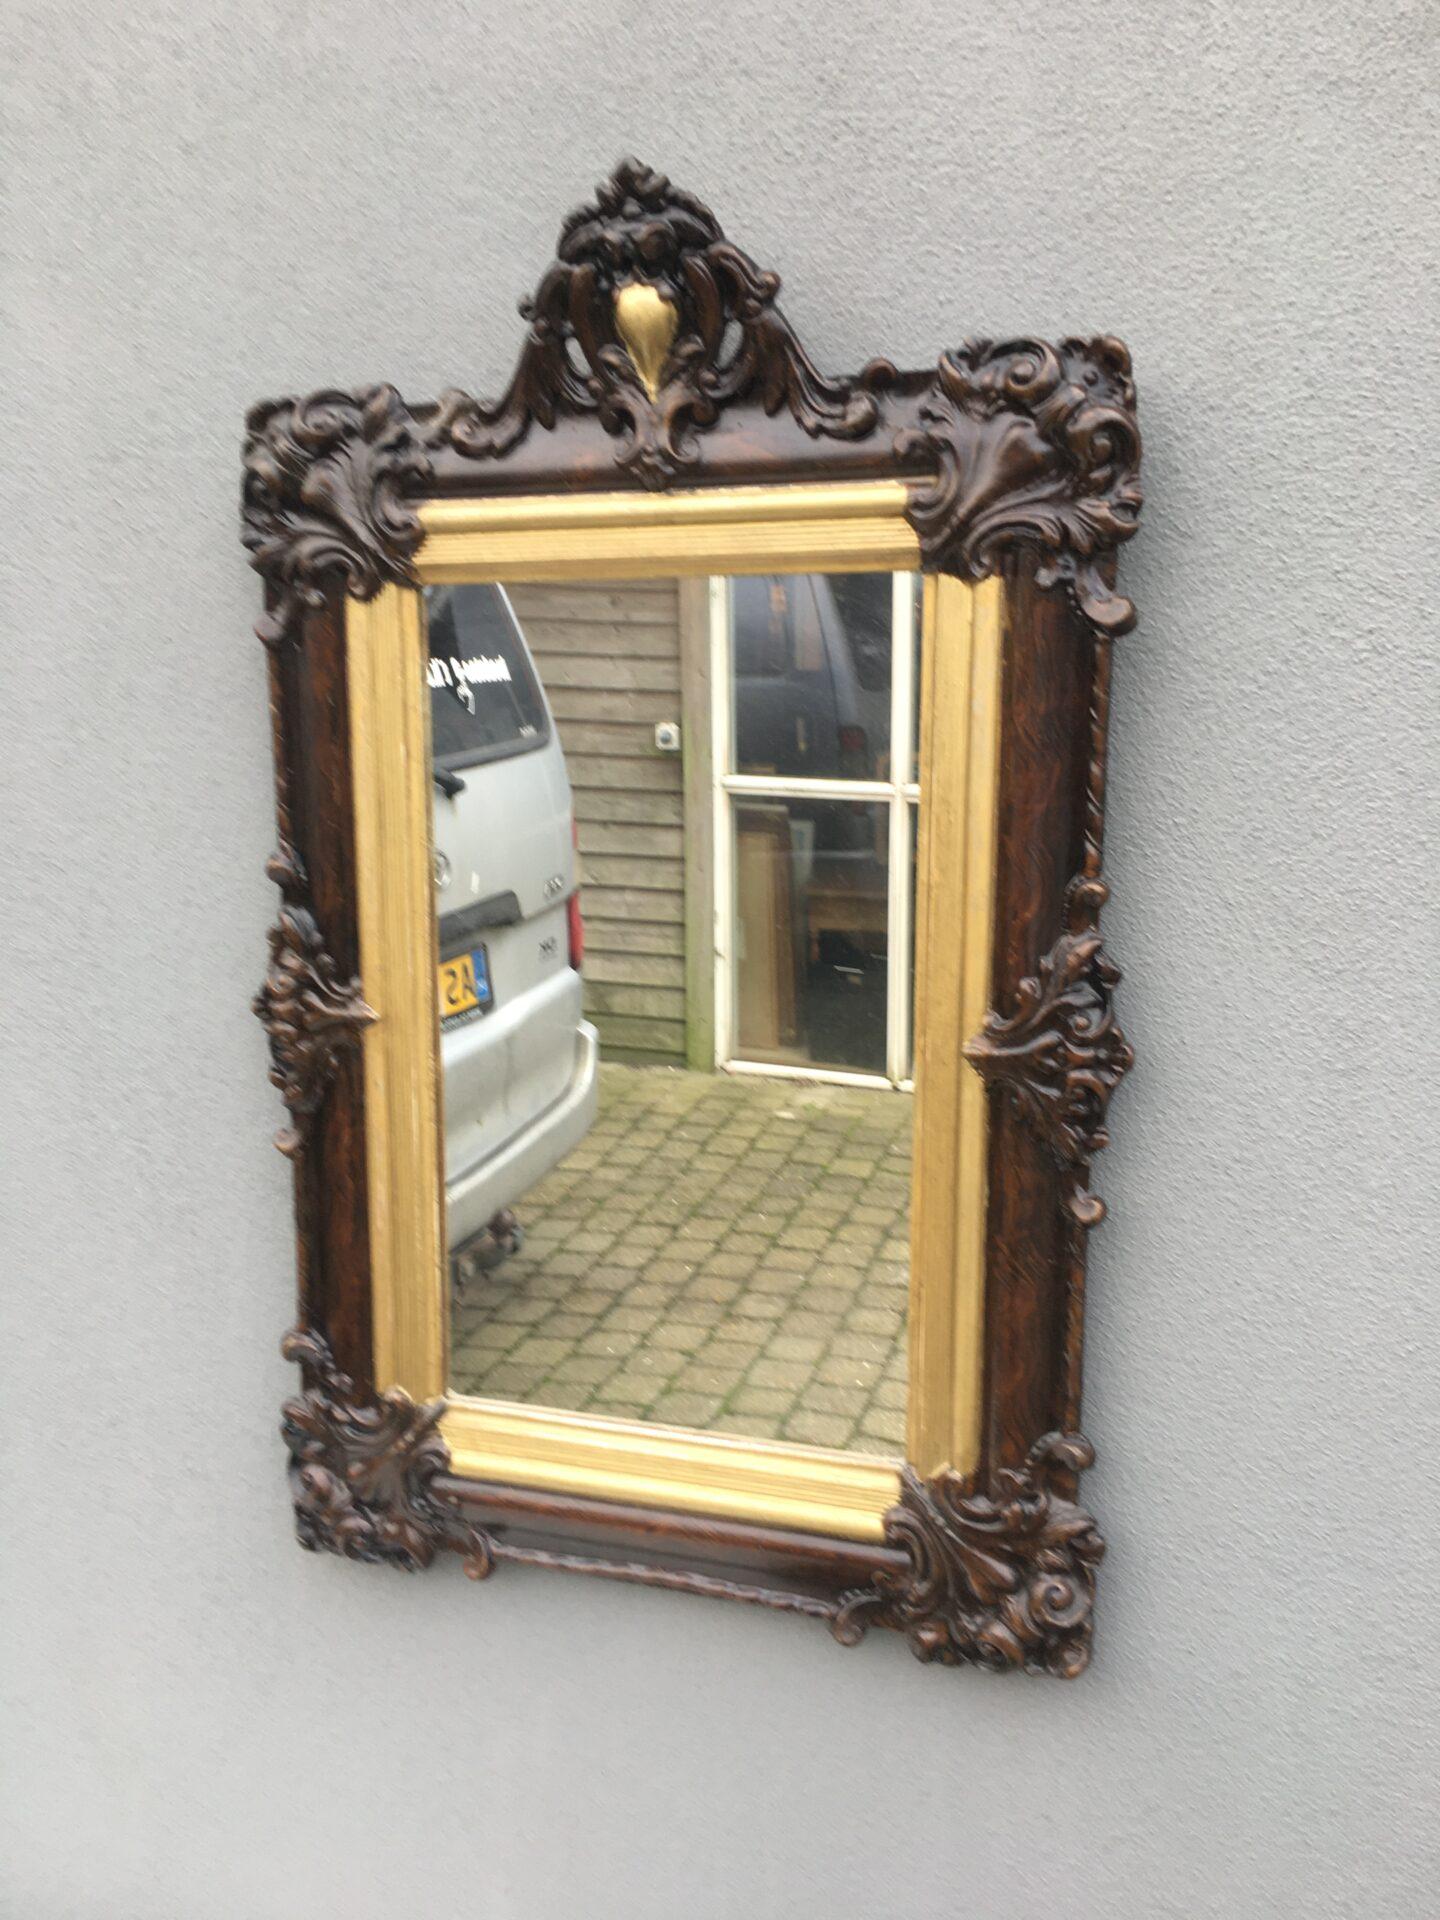 Lille fint rokoko spejl fra 1800-tallet, 65x45 cm, pris 600kr